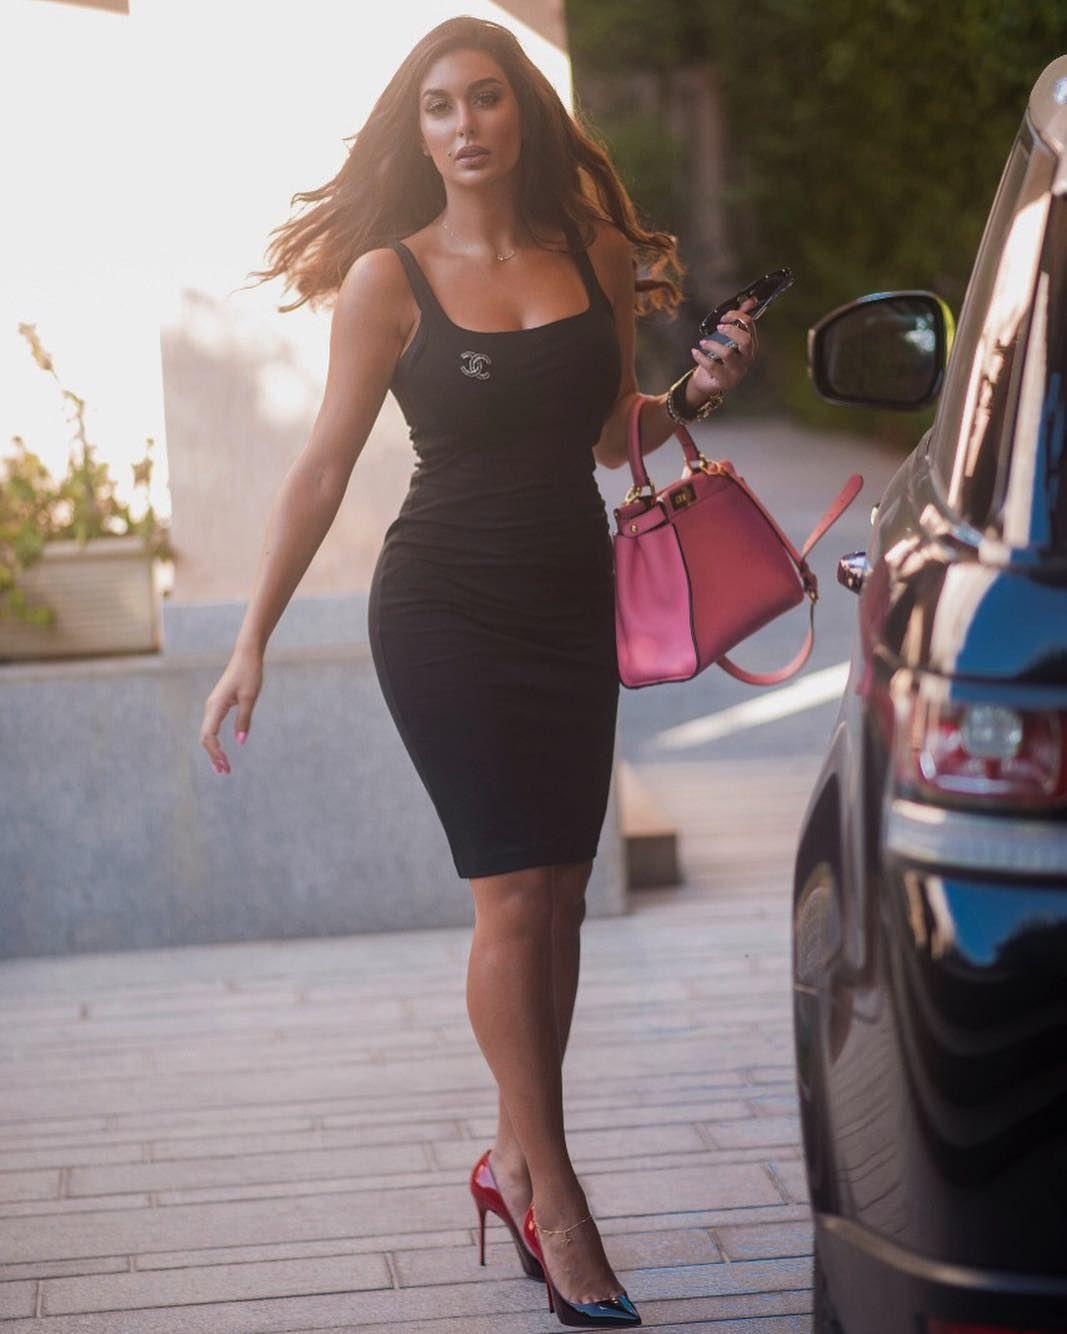 71 4k Likes 378 Comments Yasmine Sabri Yasmine Sabri On Instagram يتمسكون بطفولتهم رغم السنوات تبقى قلوبهم Fashion Outfits Arab Celebrities Fashion